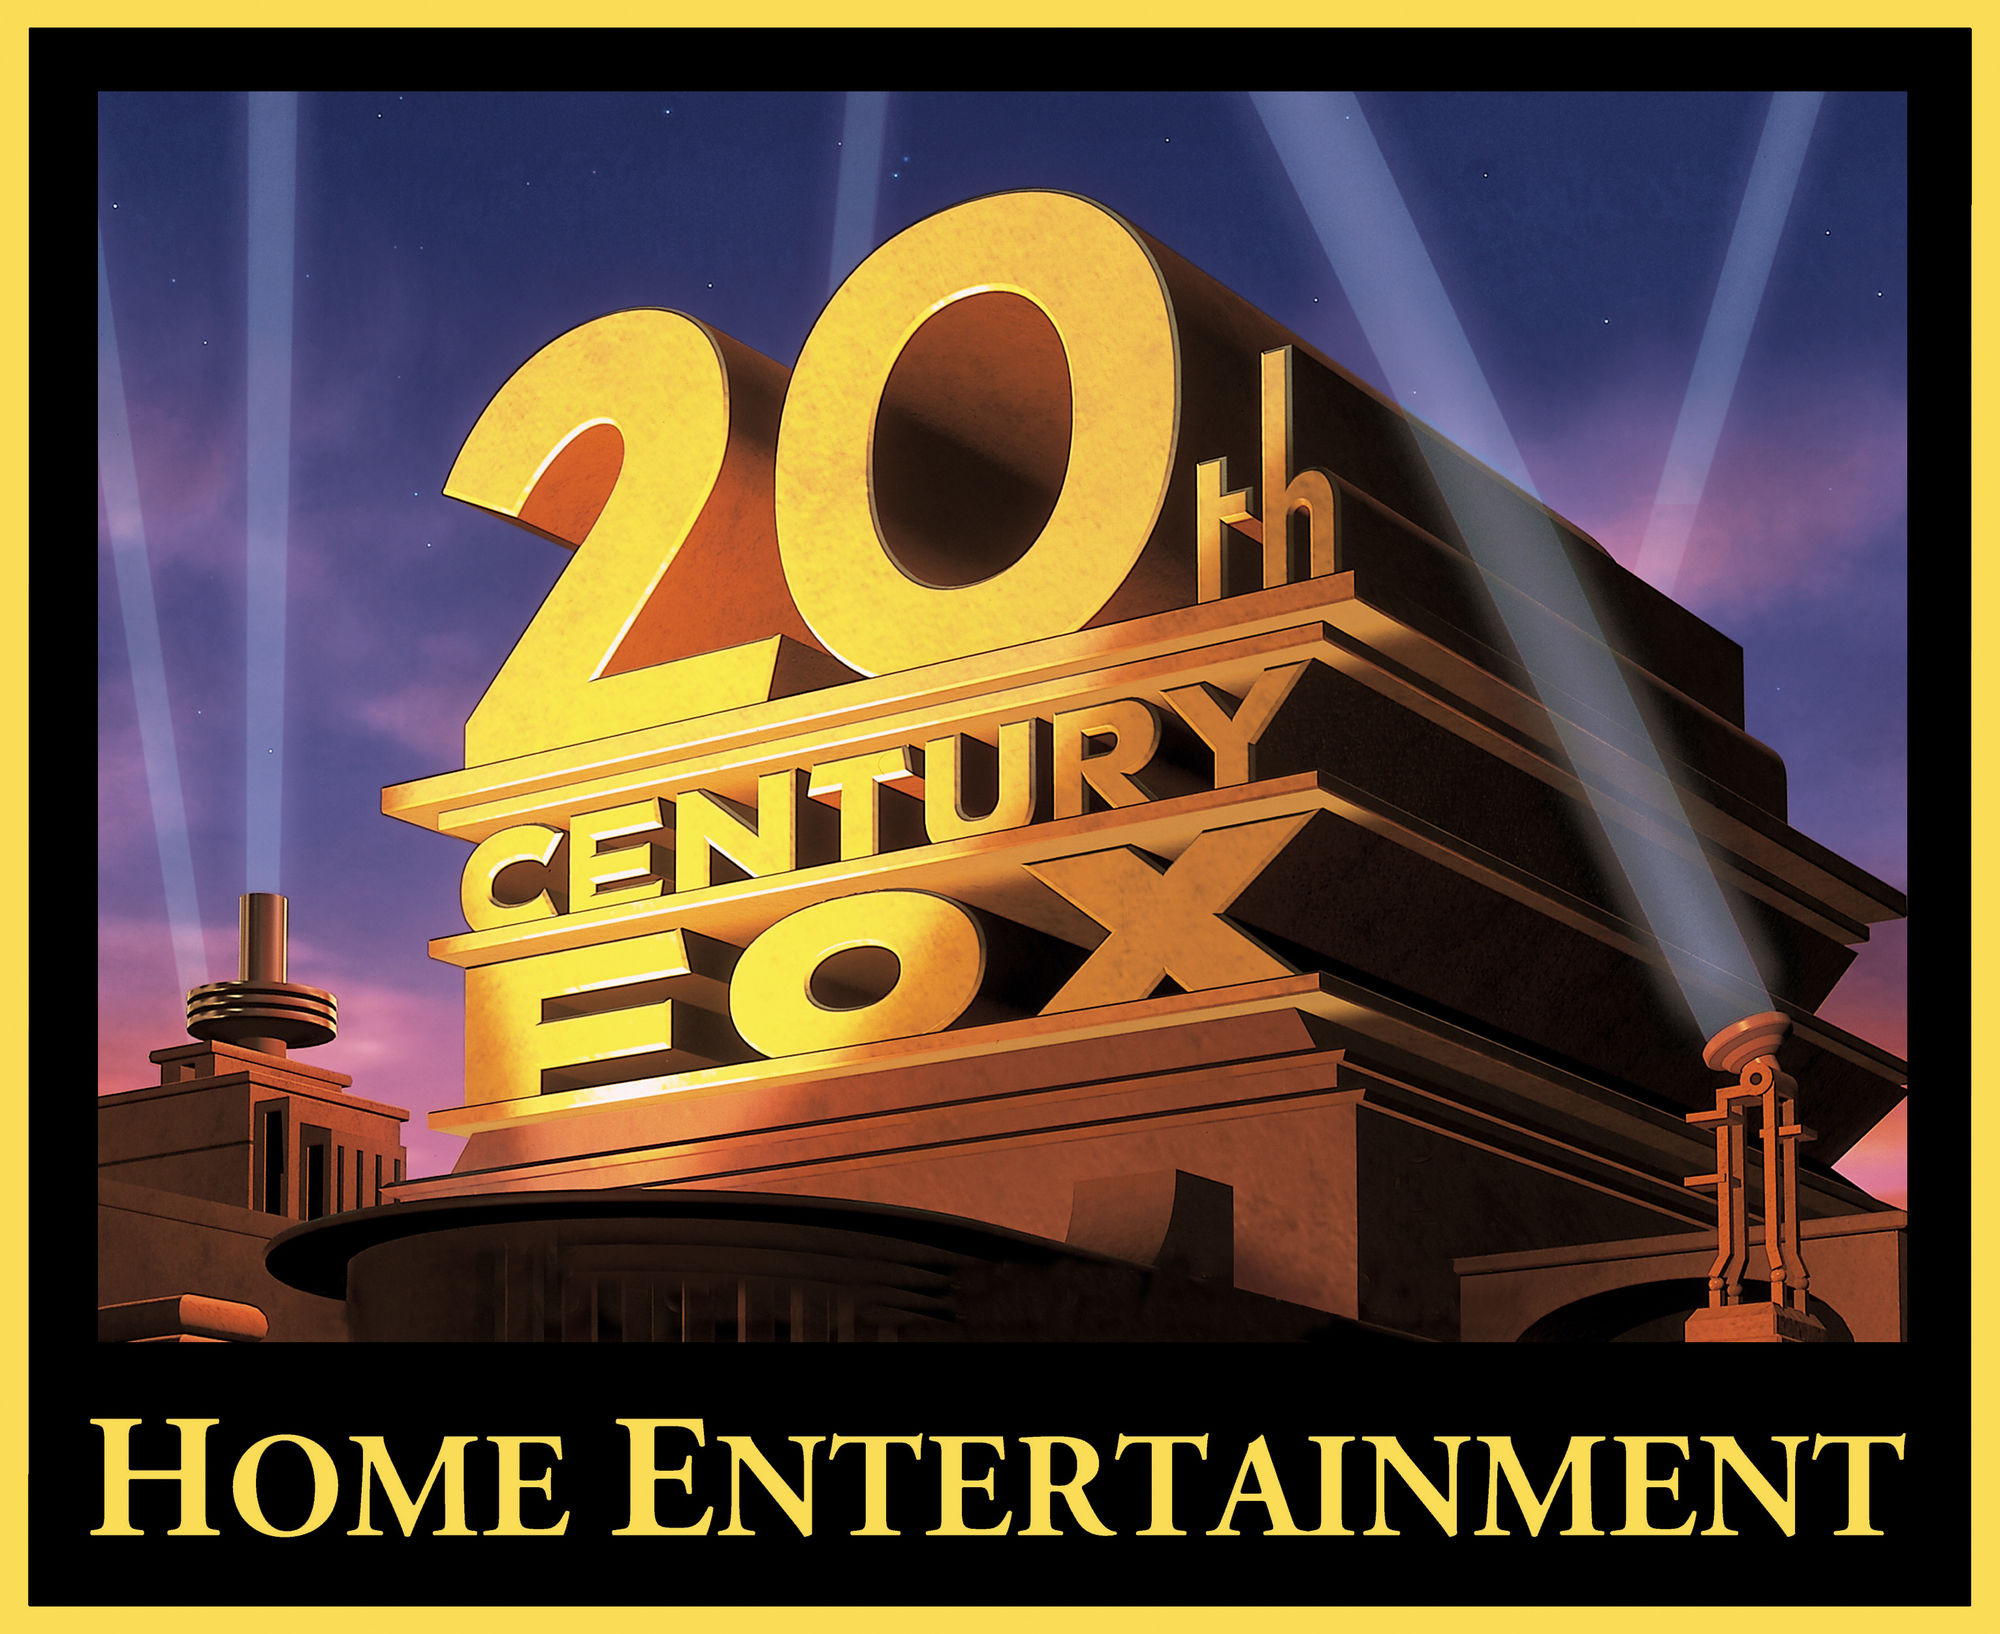 20th_Century_Fox_Home_Entertainment_(1995).jpg